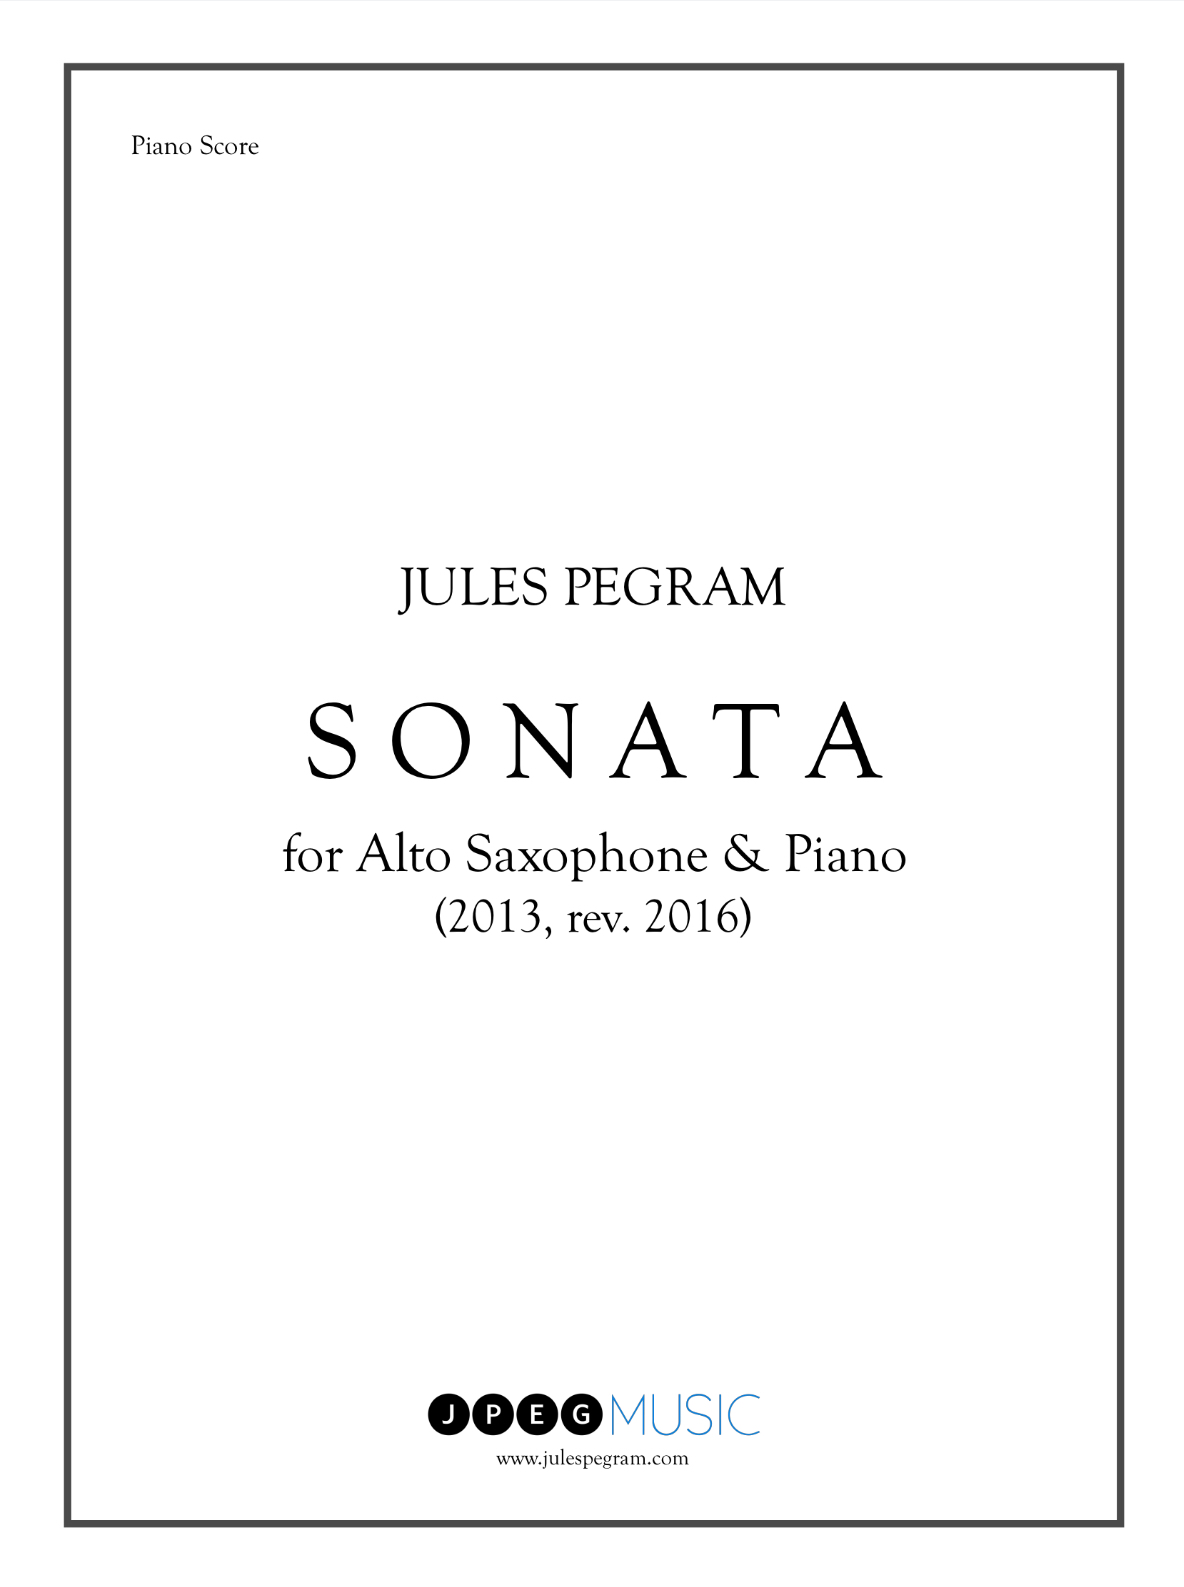 Sonata For Alto Saxophone & Piano by Jules Pegram